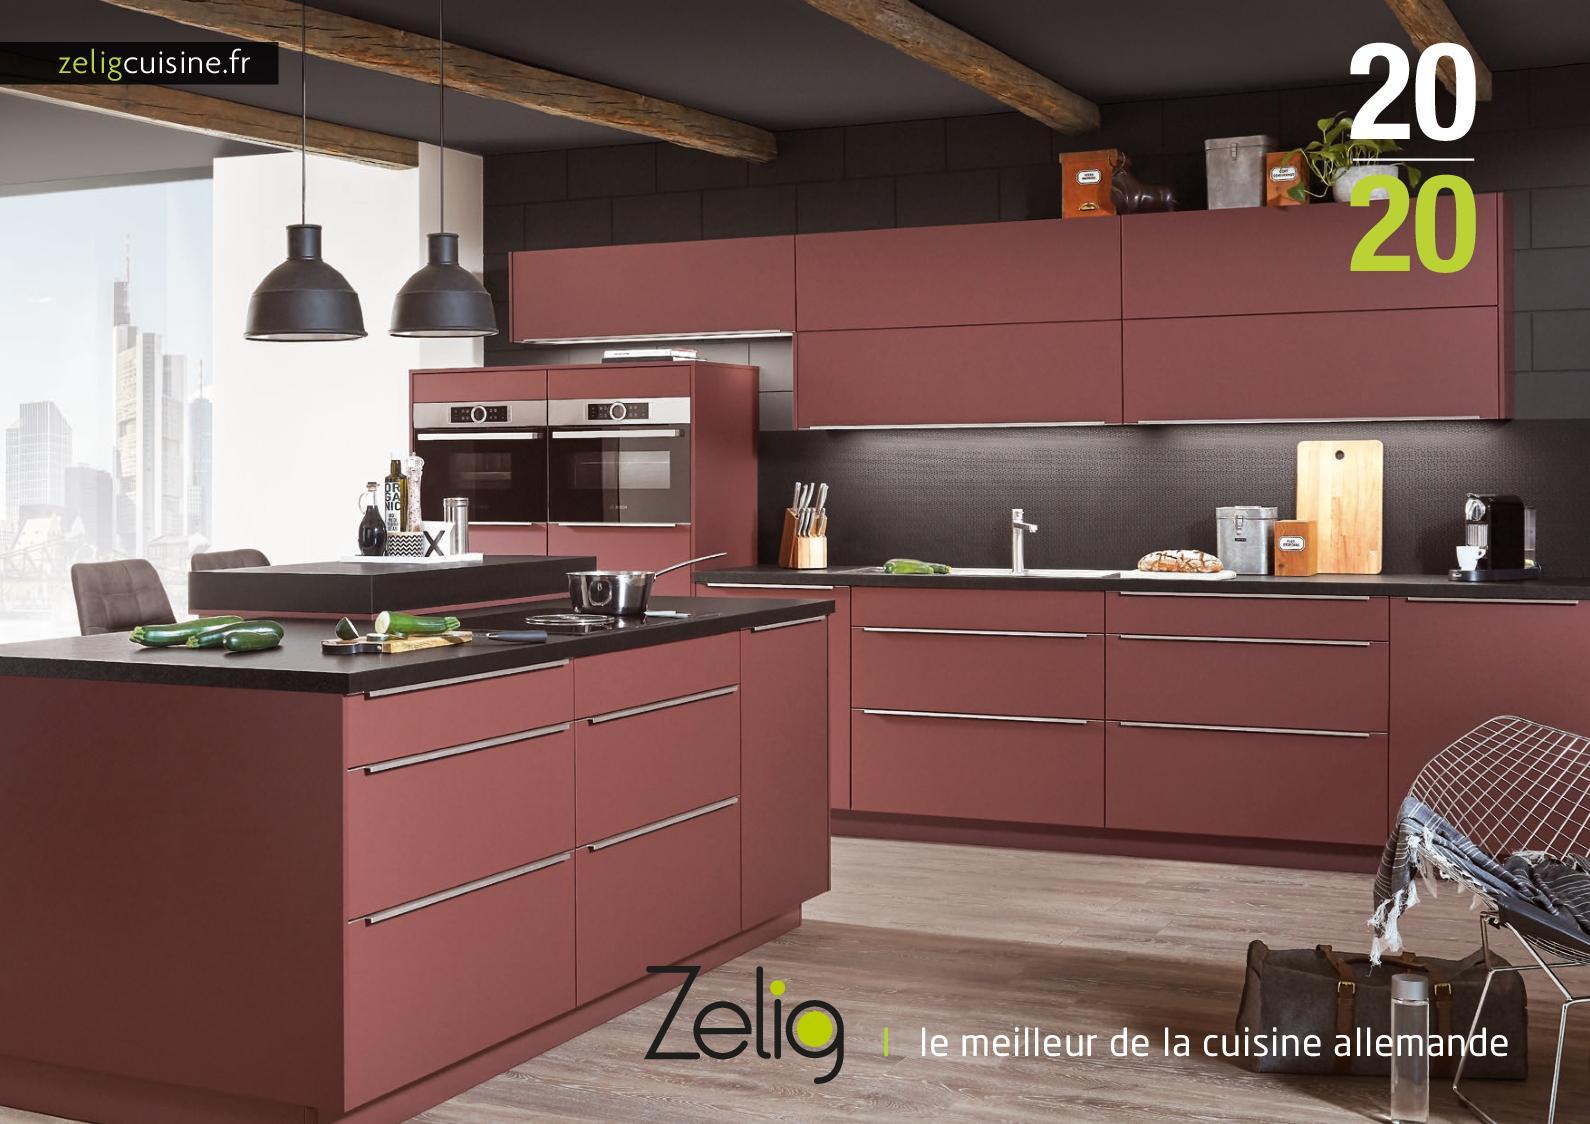 Calaméo - Catalogue Zelig 13